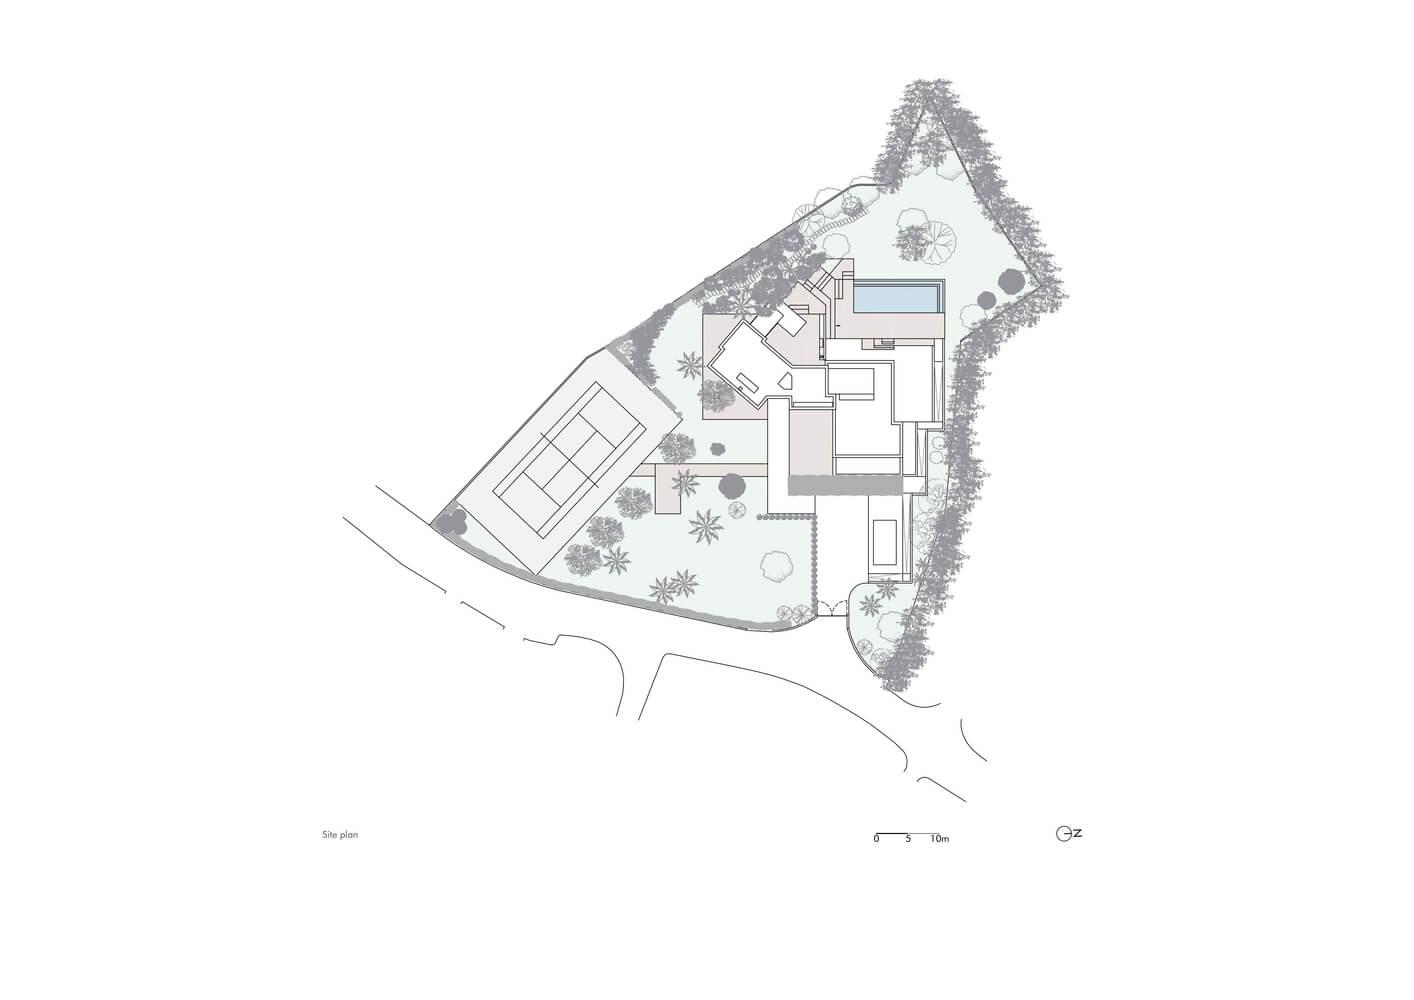 01 site plan